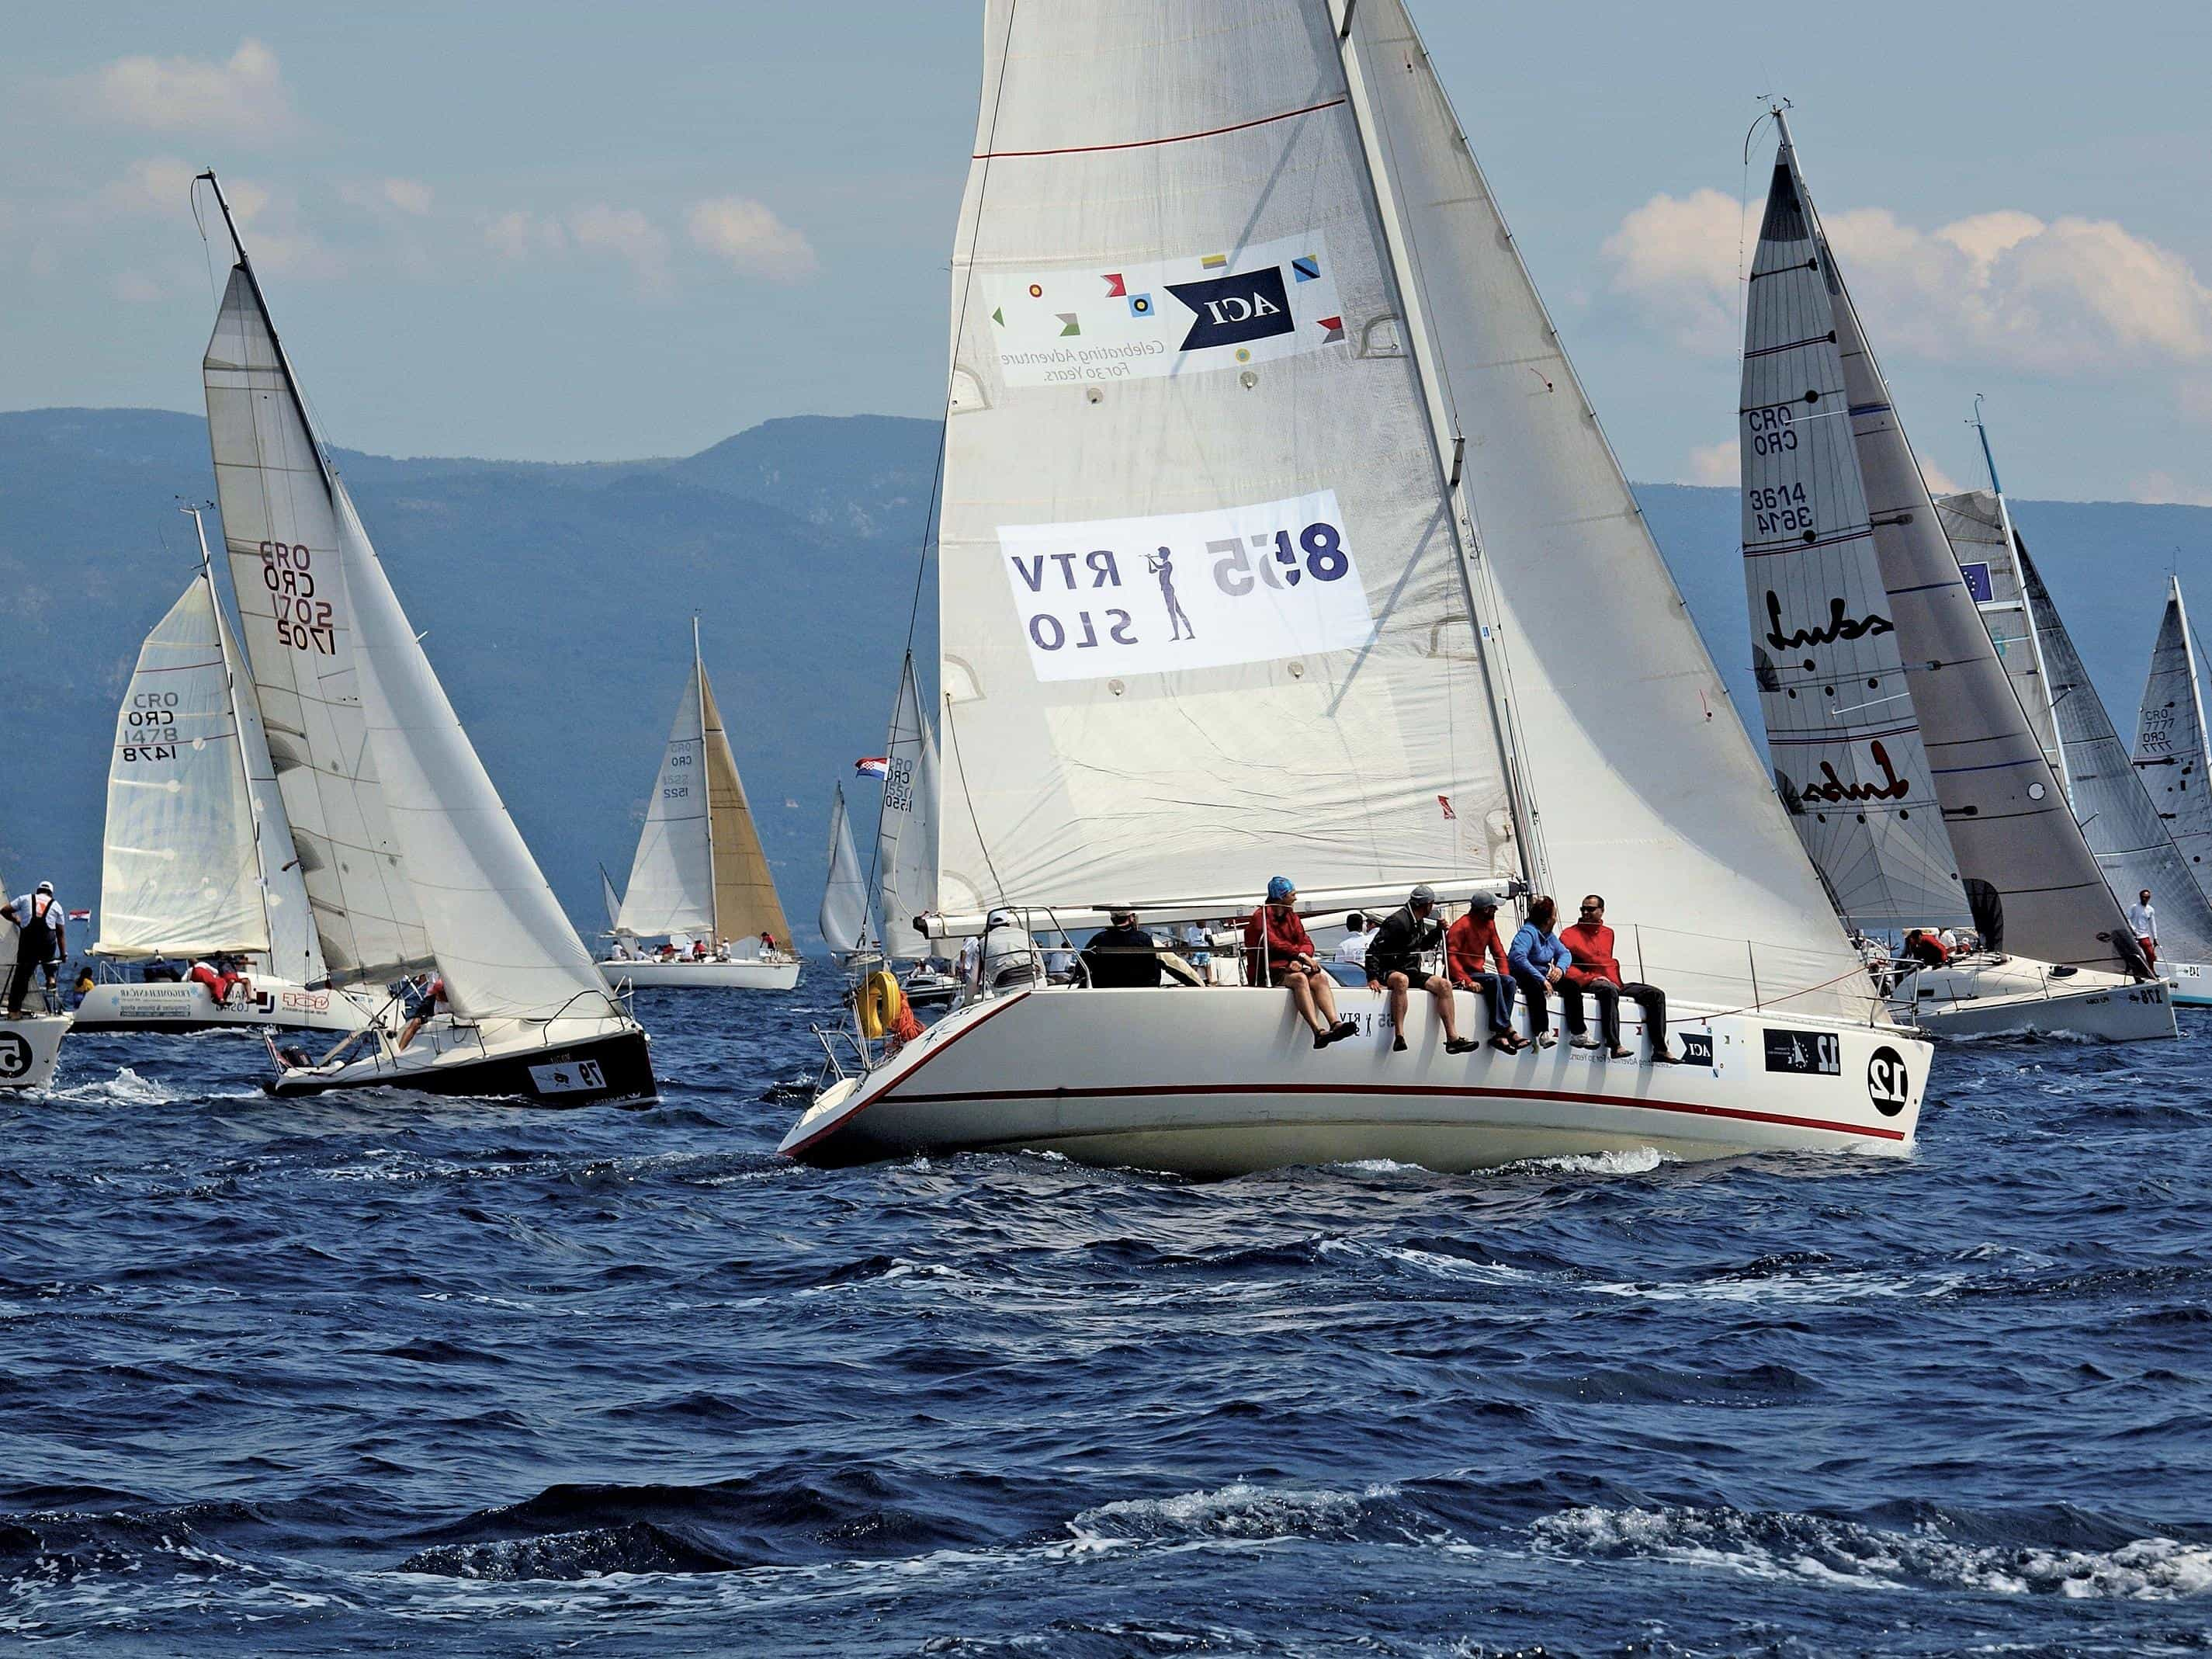 Free picture sailboat sail yacht teamwork sport team